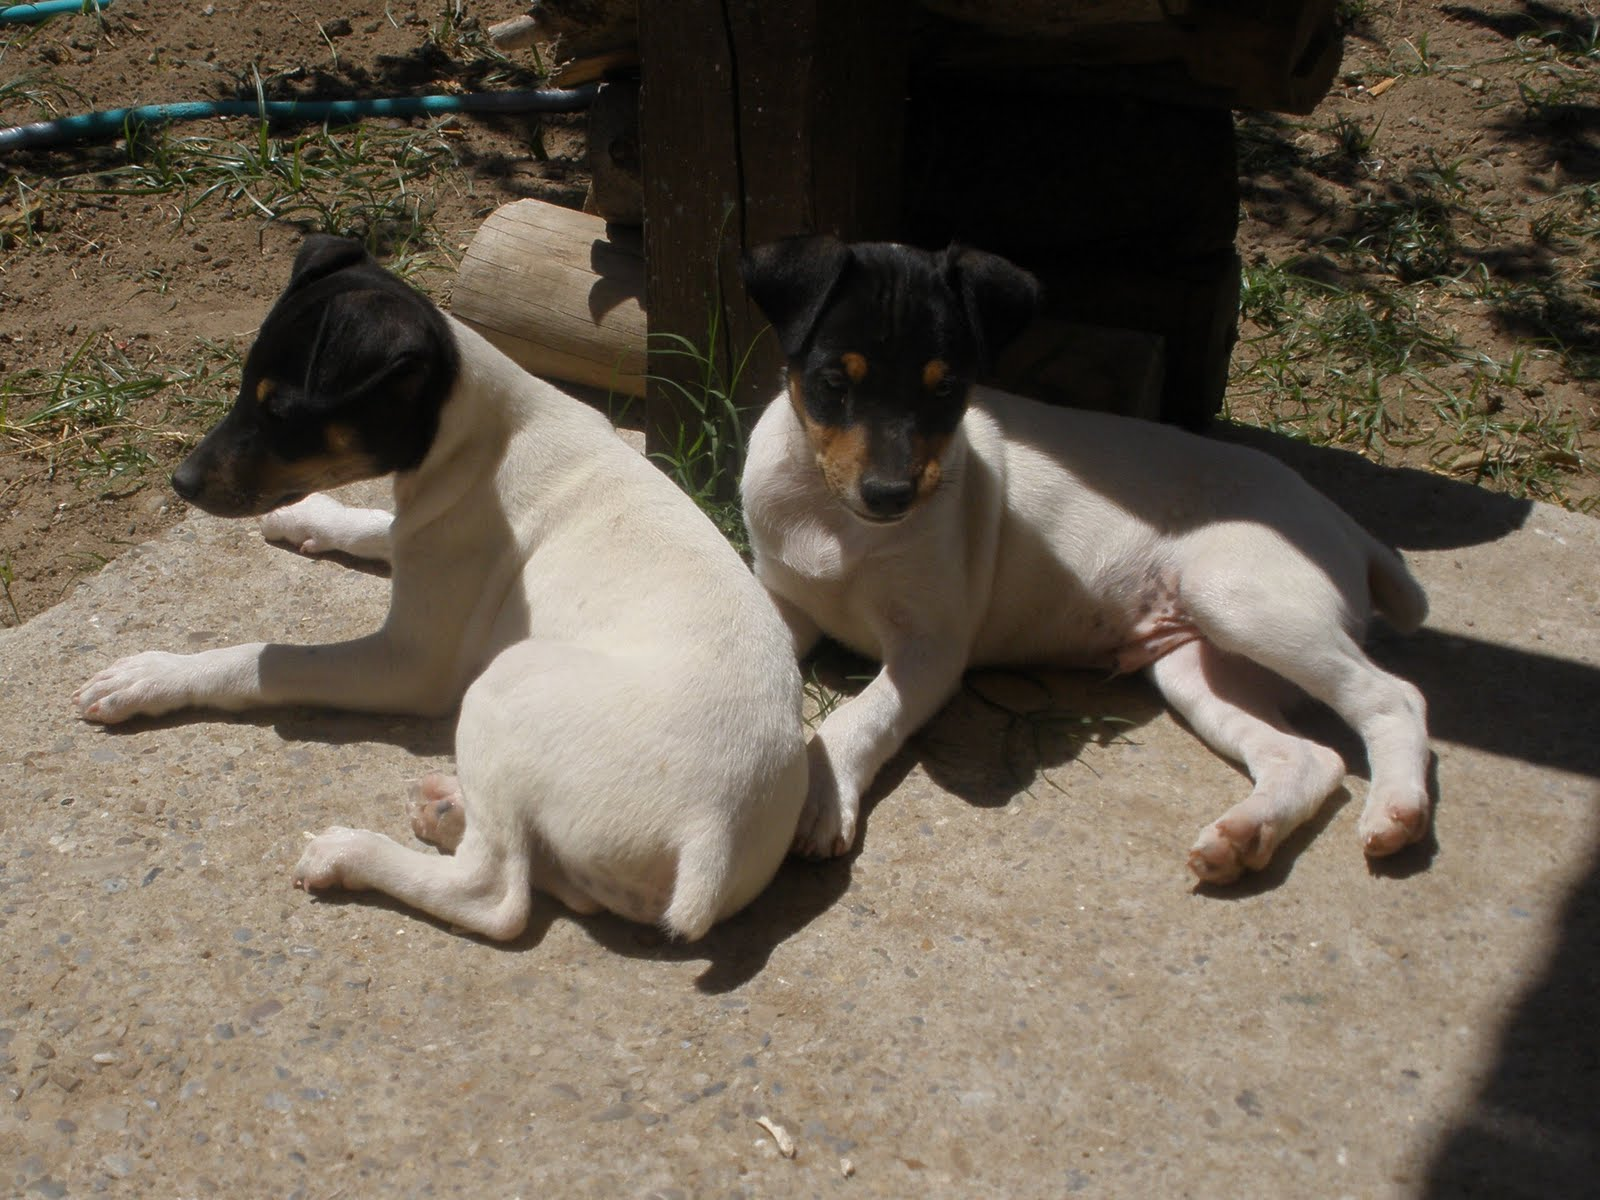 Ratonero Bodeguero Andaluz Puppies: Ratonero Ratonero Bodeguero Andaluz Dogs Breed